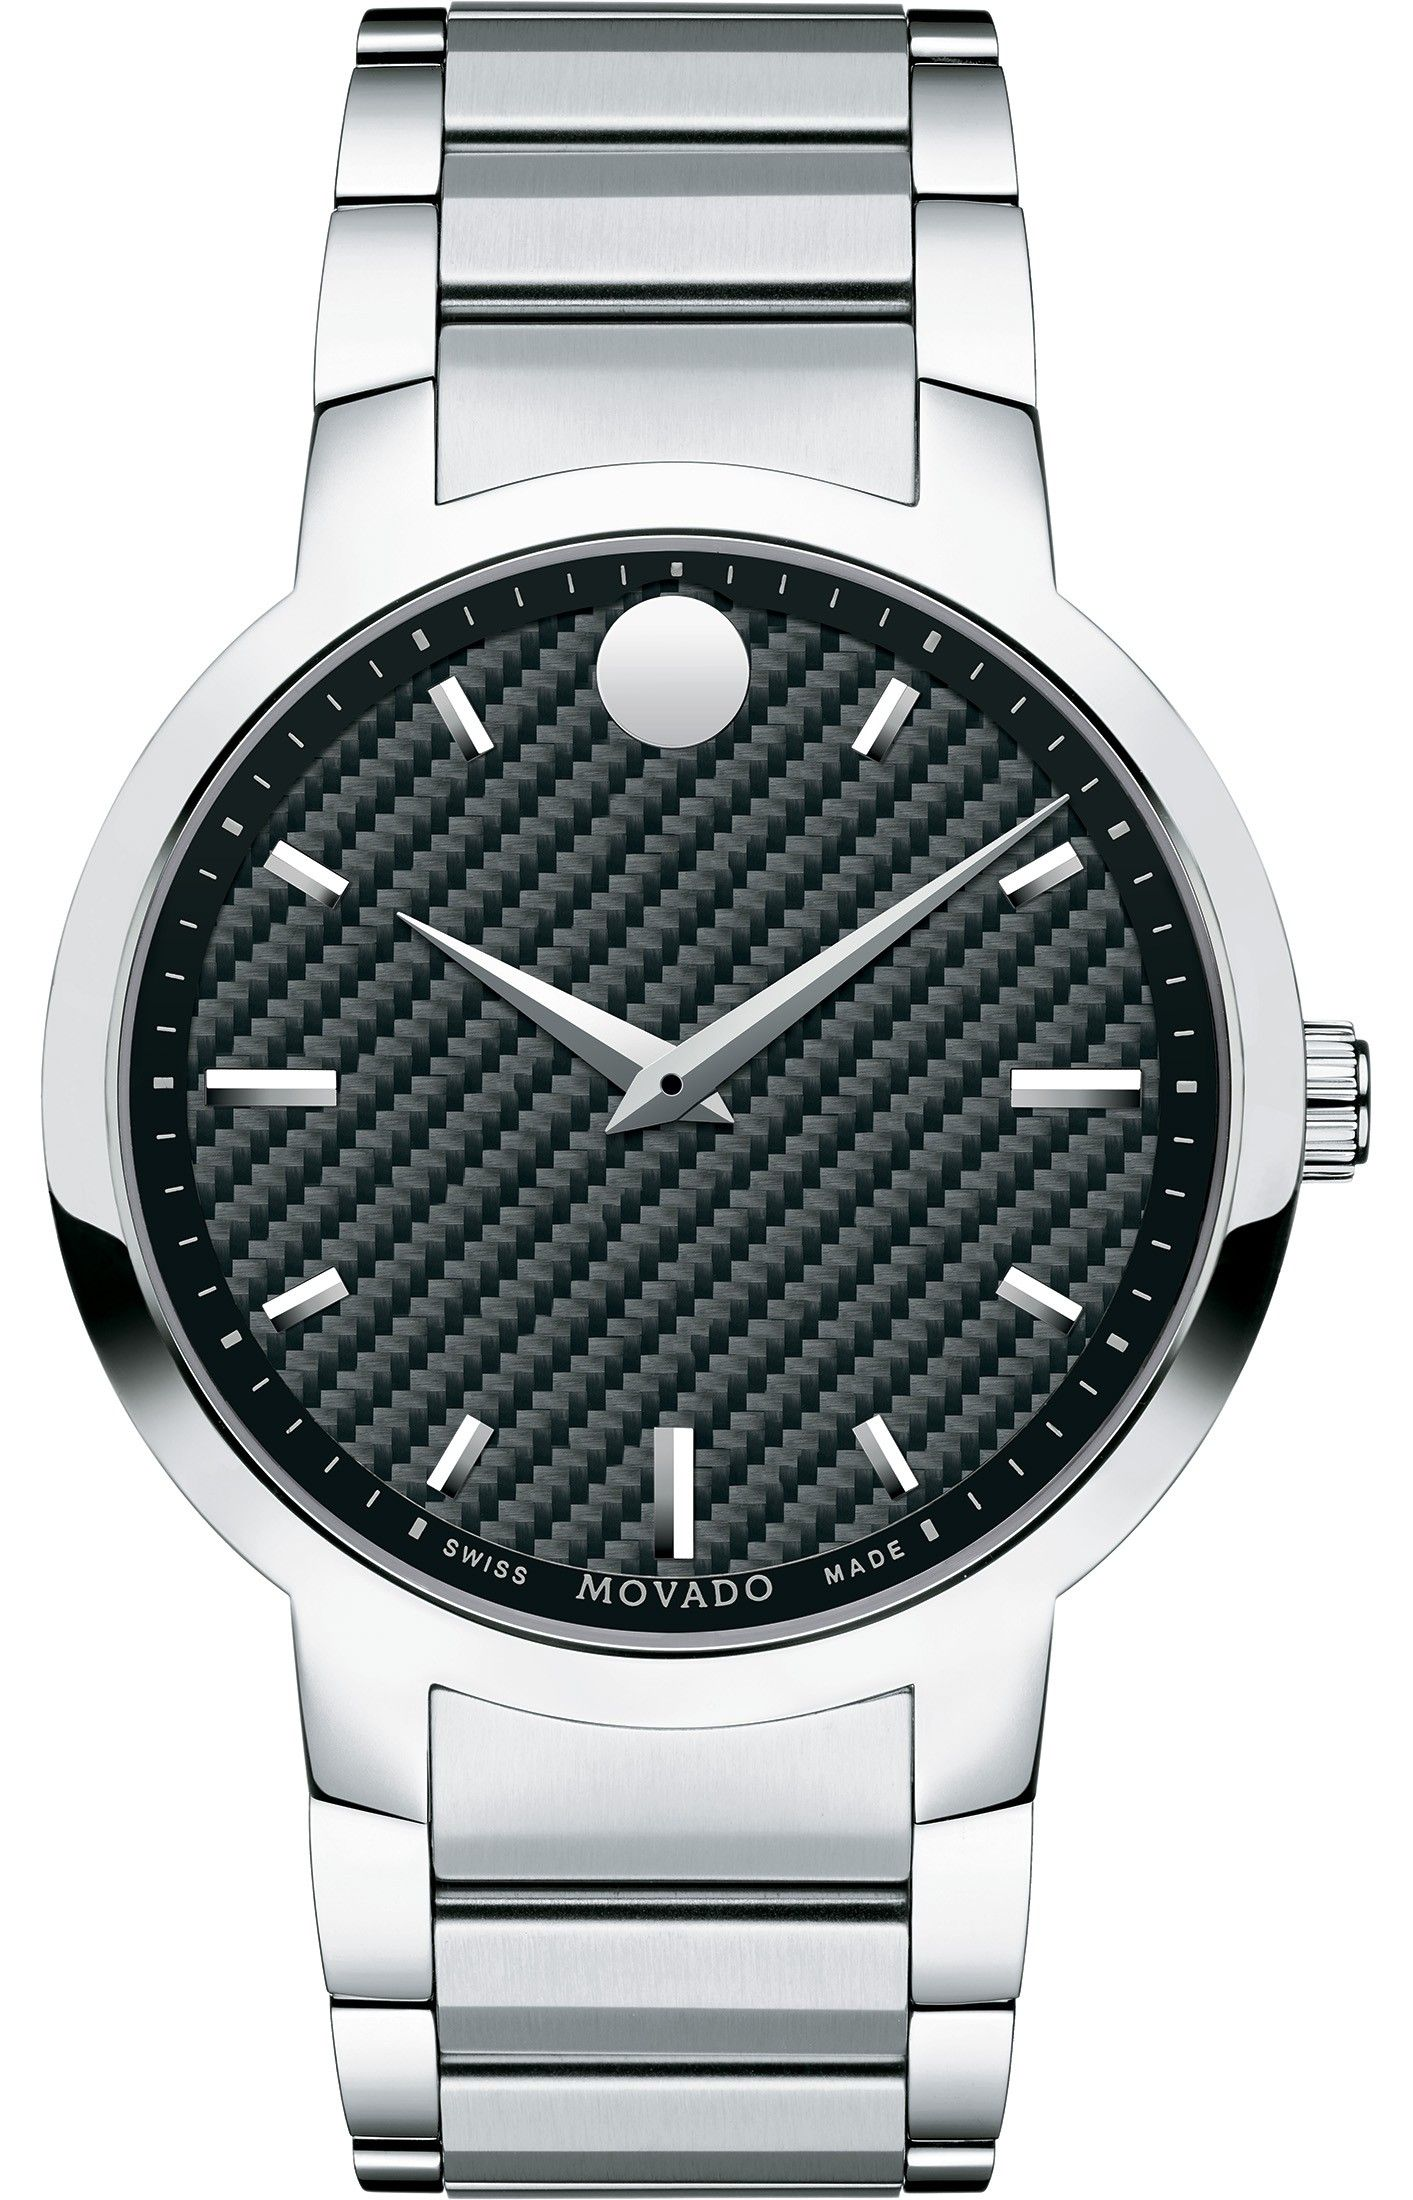 b2ced6b2df86 Gravity - Men s Gravity watch